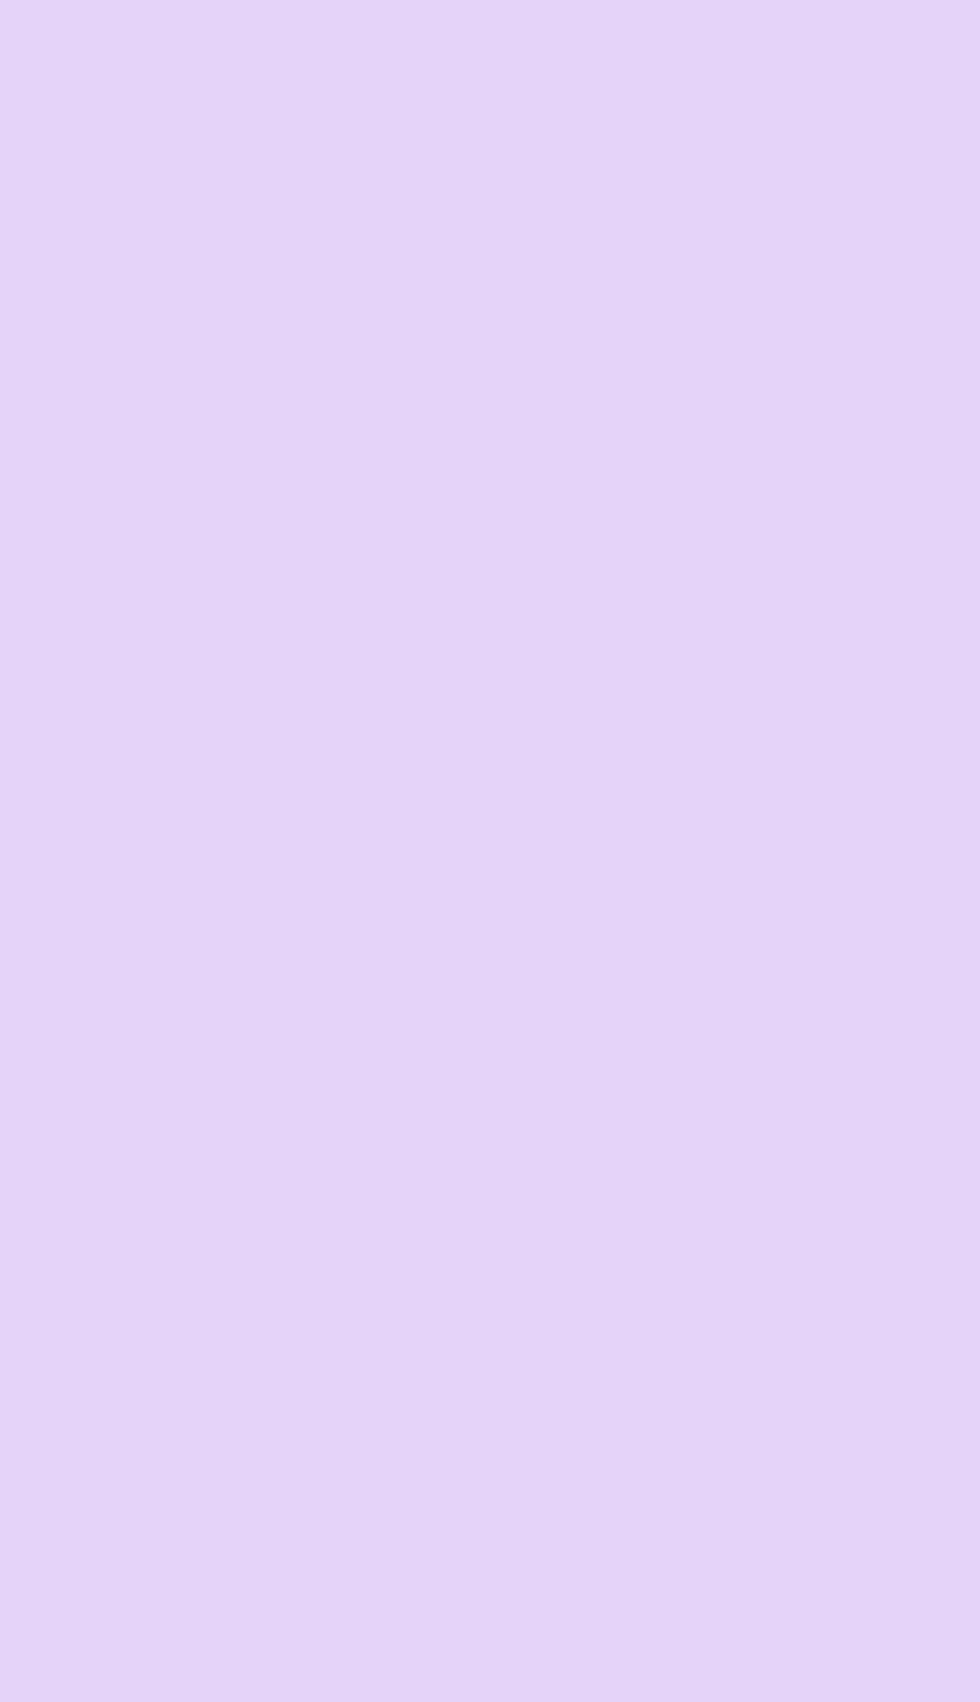 Purple-background.jpg